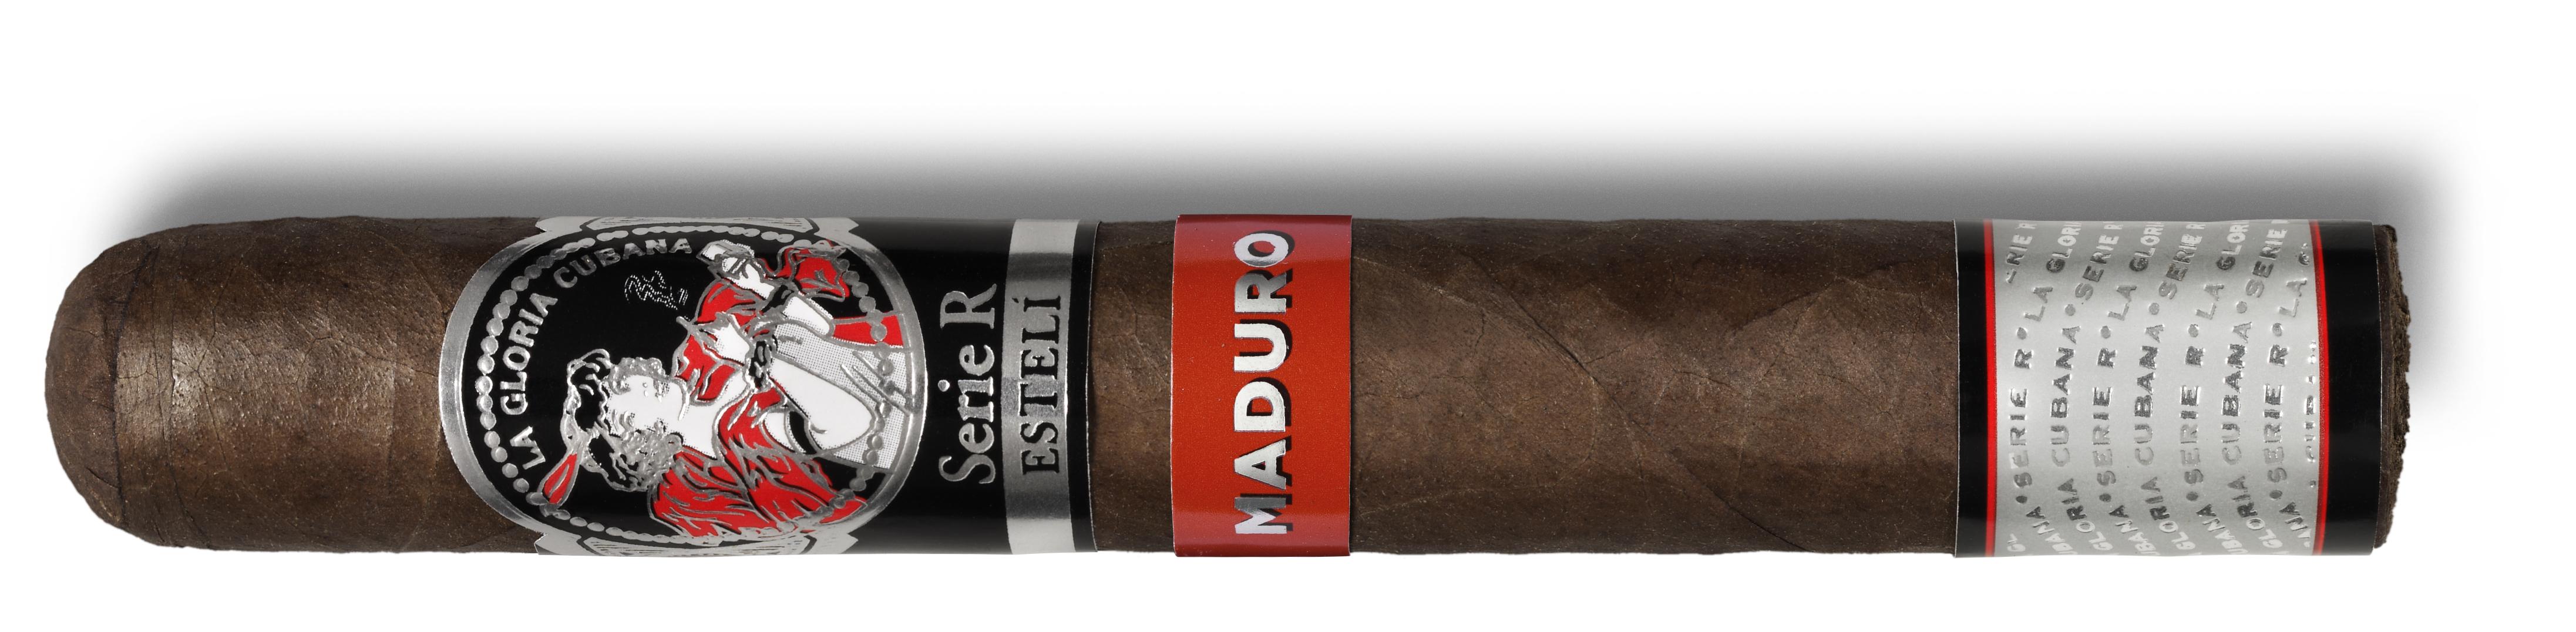 La Gloria_Serie R_Esteli_Maduro_cigar